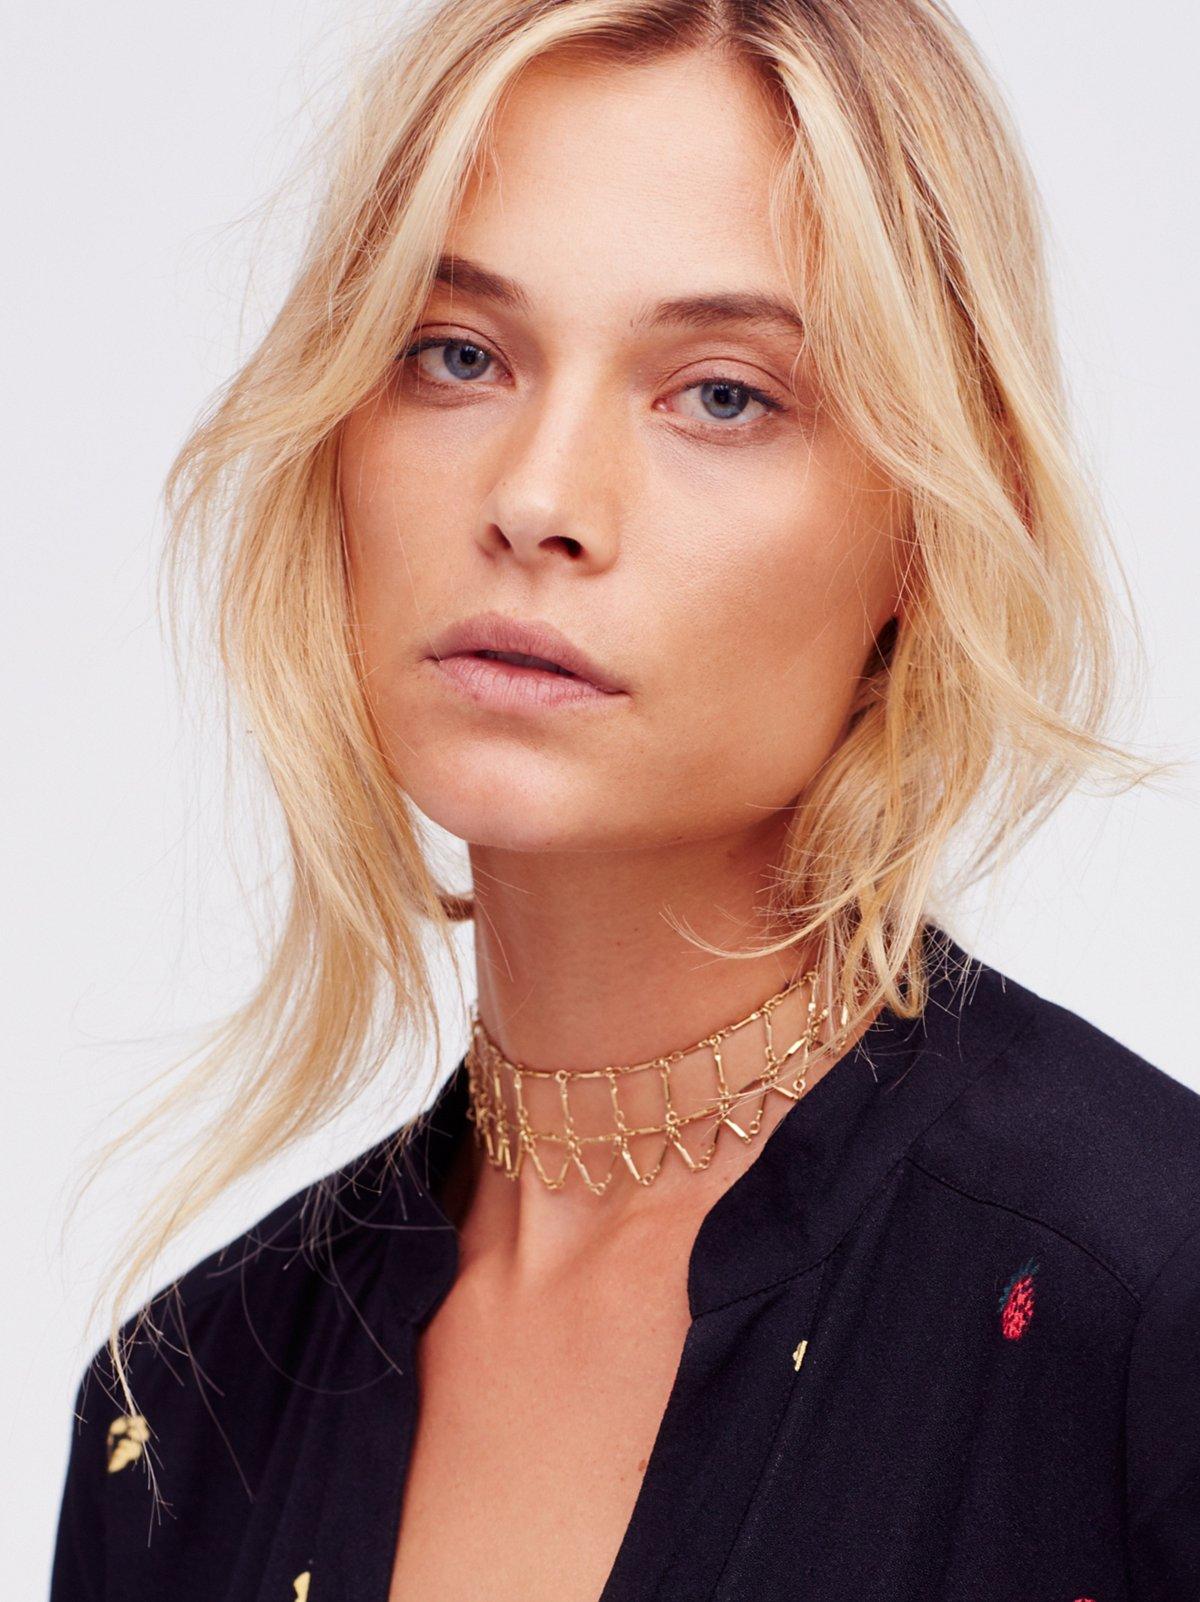 Lana Delicate Chain Choker